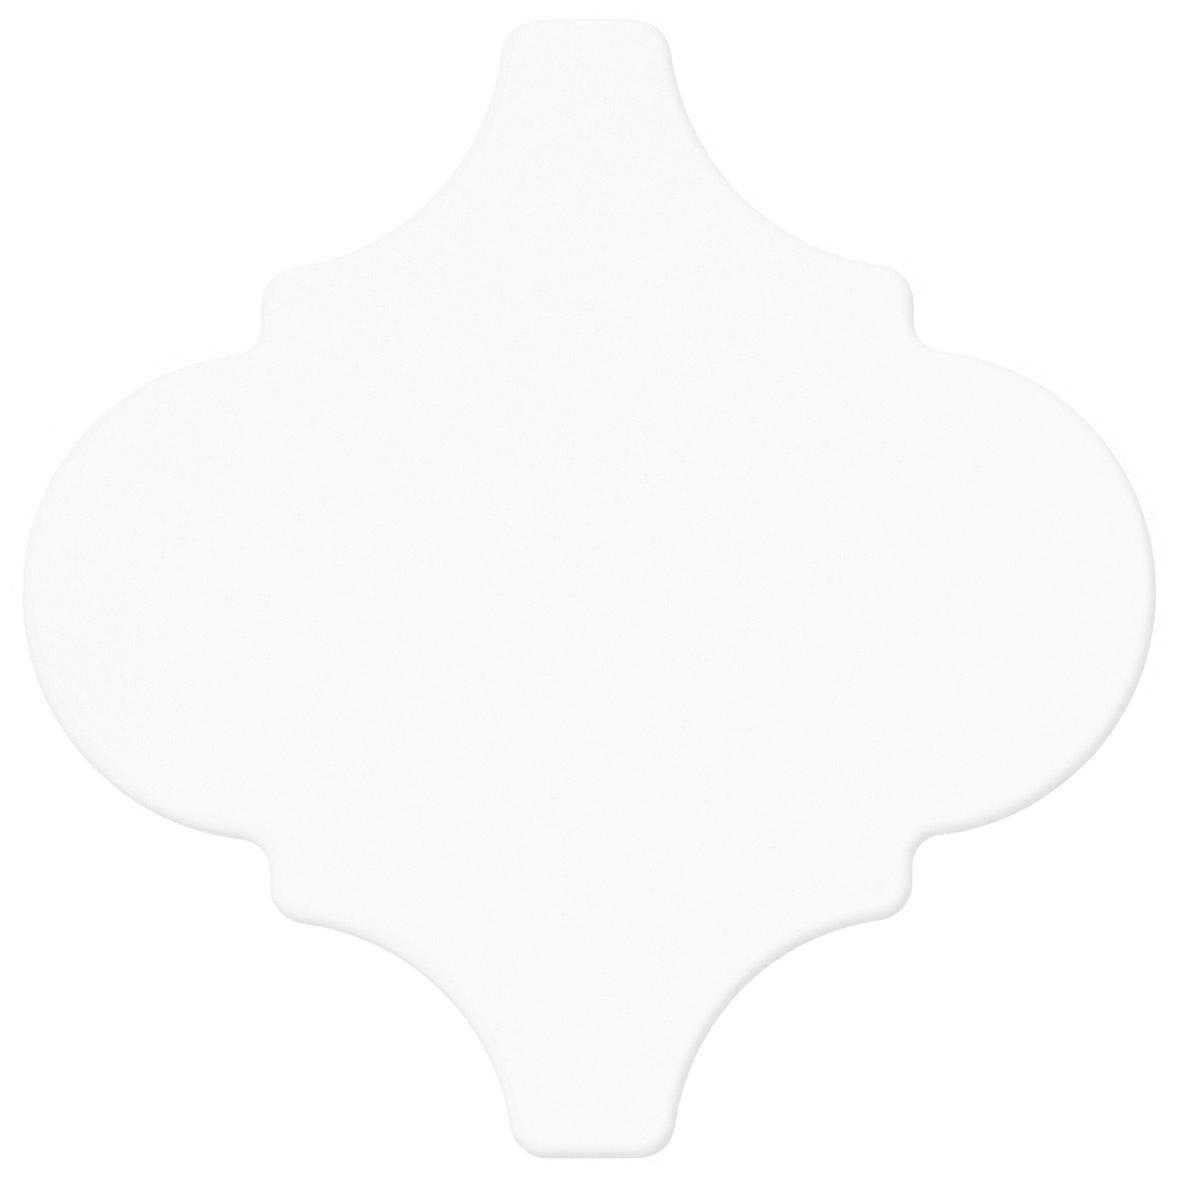 ARB0300, Arabesque, Valkoinen, seina